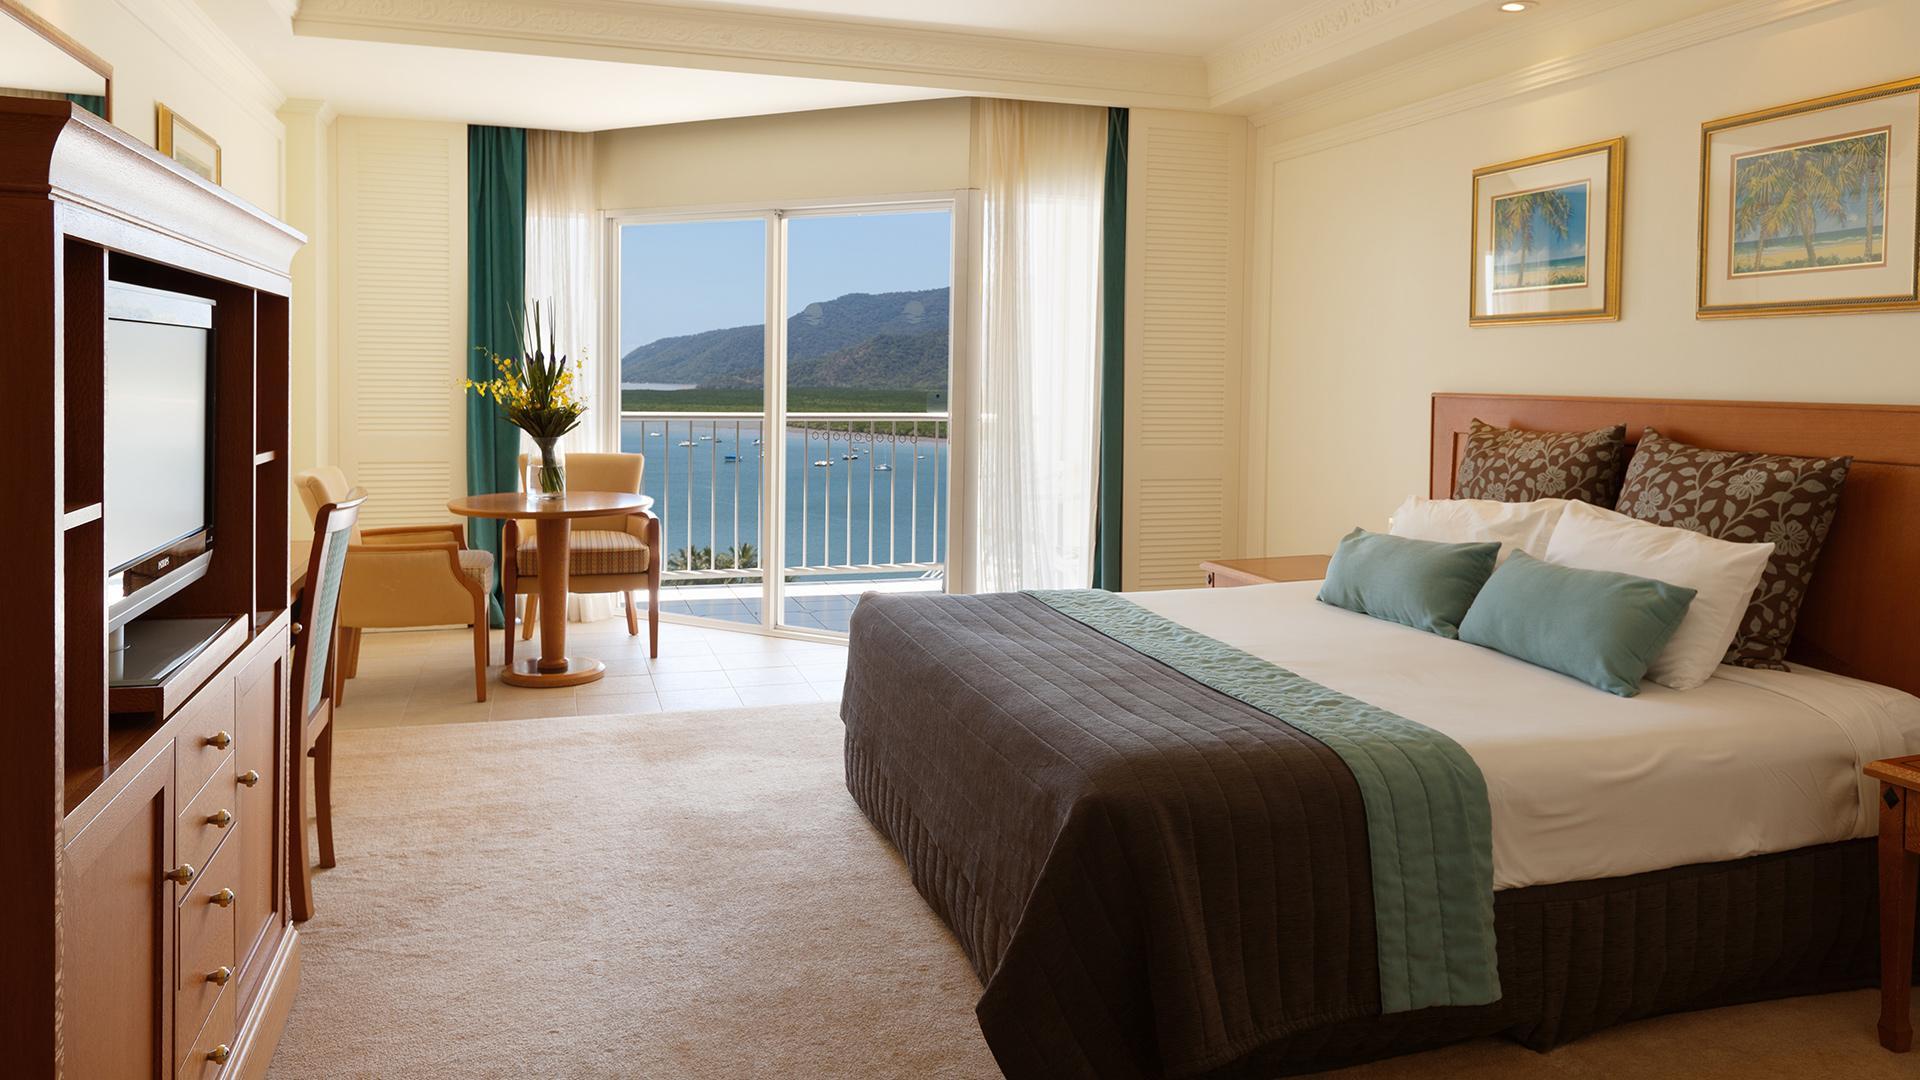 Premium Harbour View Room image 1 at Pullman Cairns International by Cairns Regional, Queensland, Australia